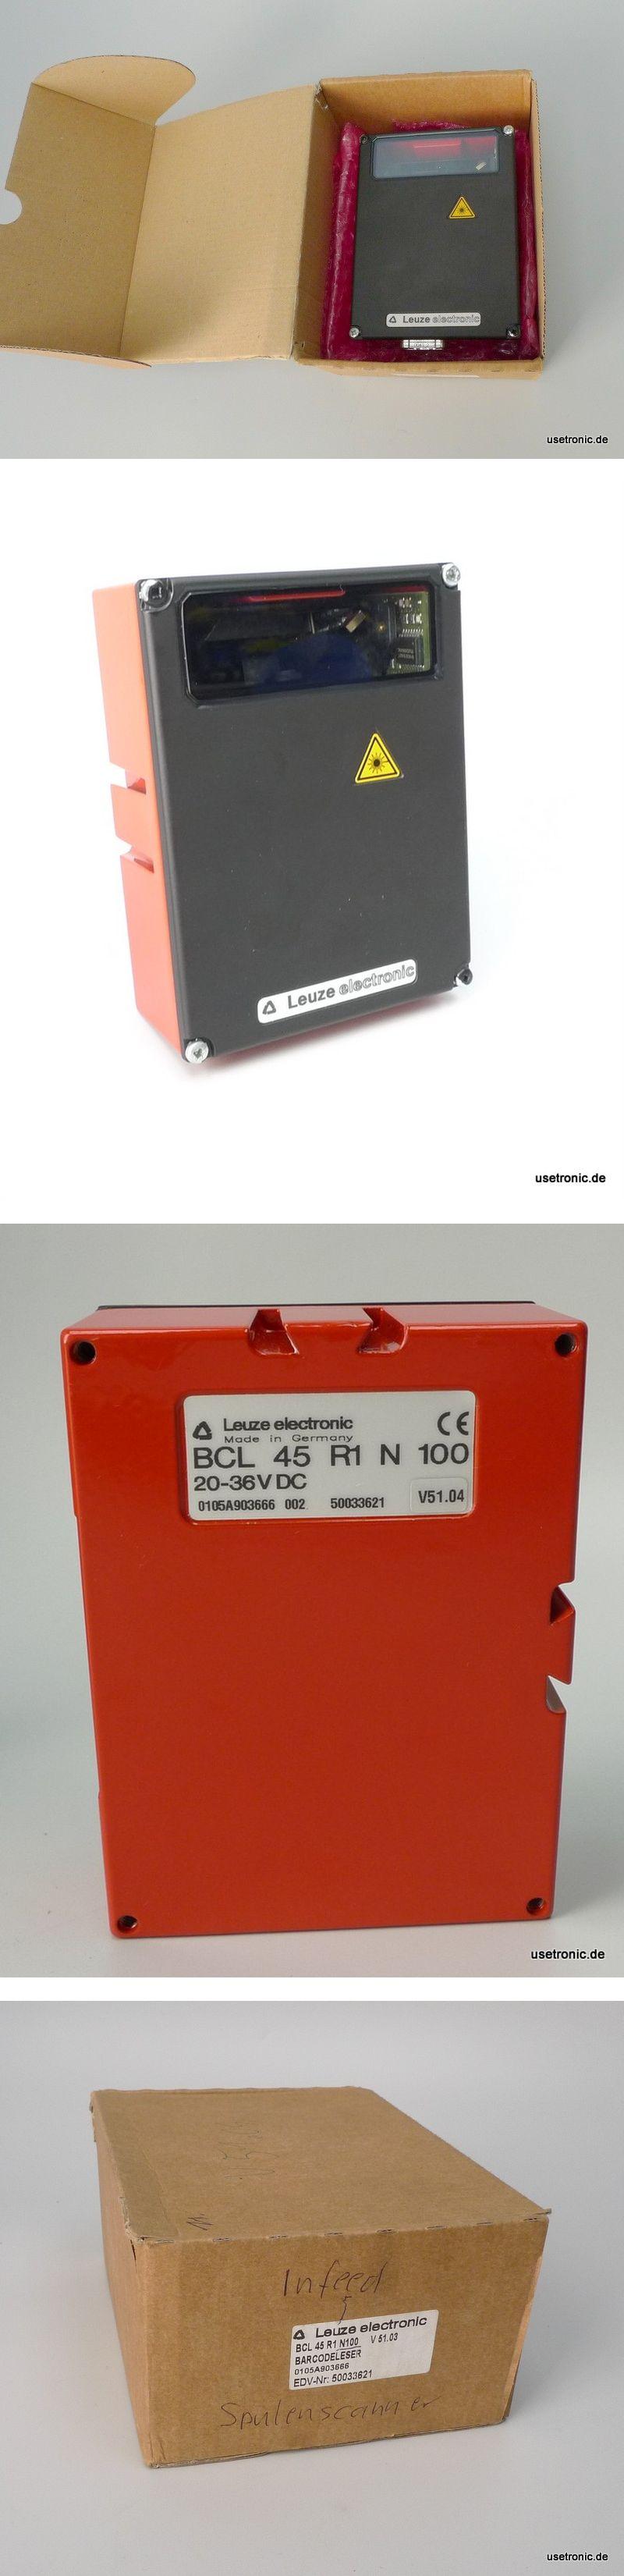 Leuze BCL 45 R1 N 100